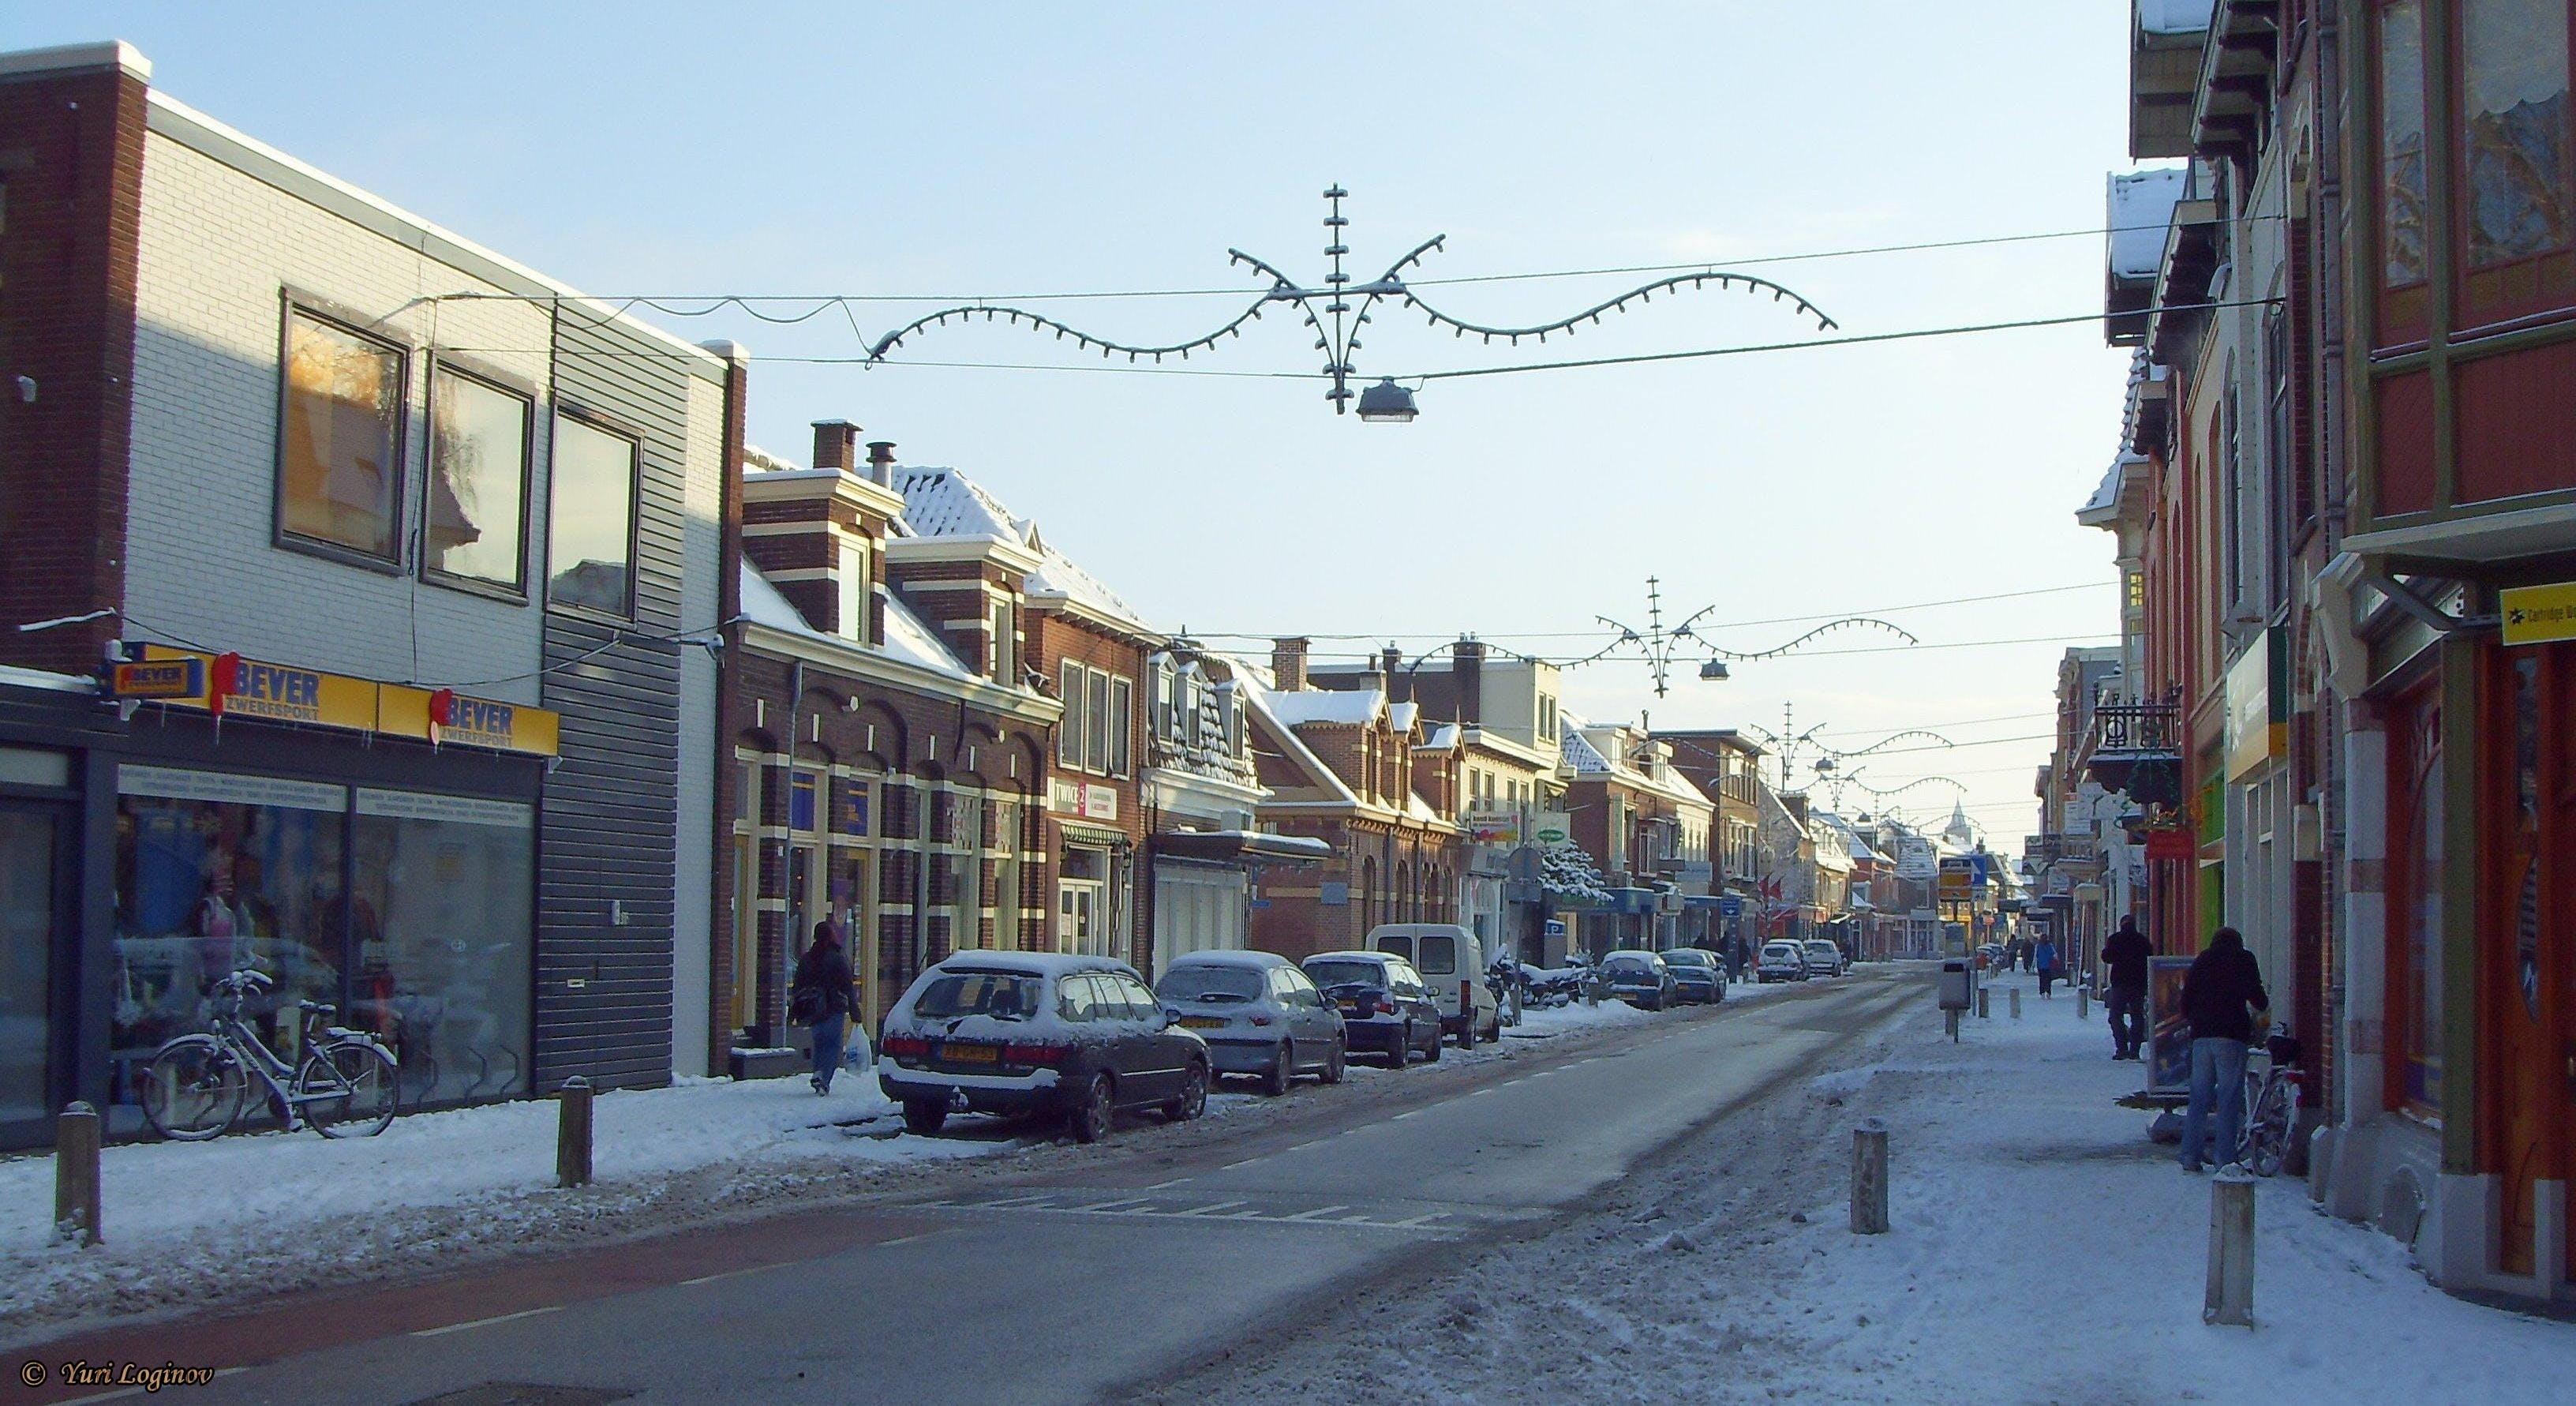 Free stock photo of Assendorpestraat, Nederland, netherlands, zwolle